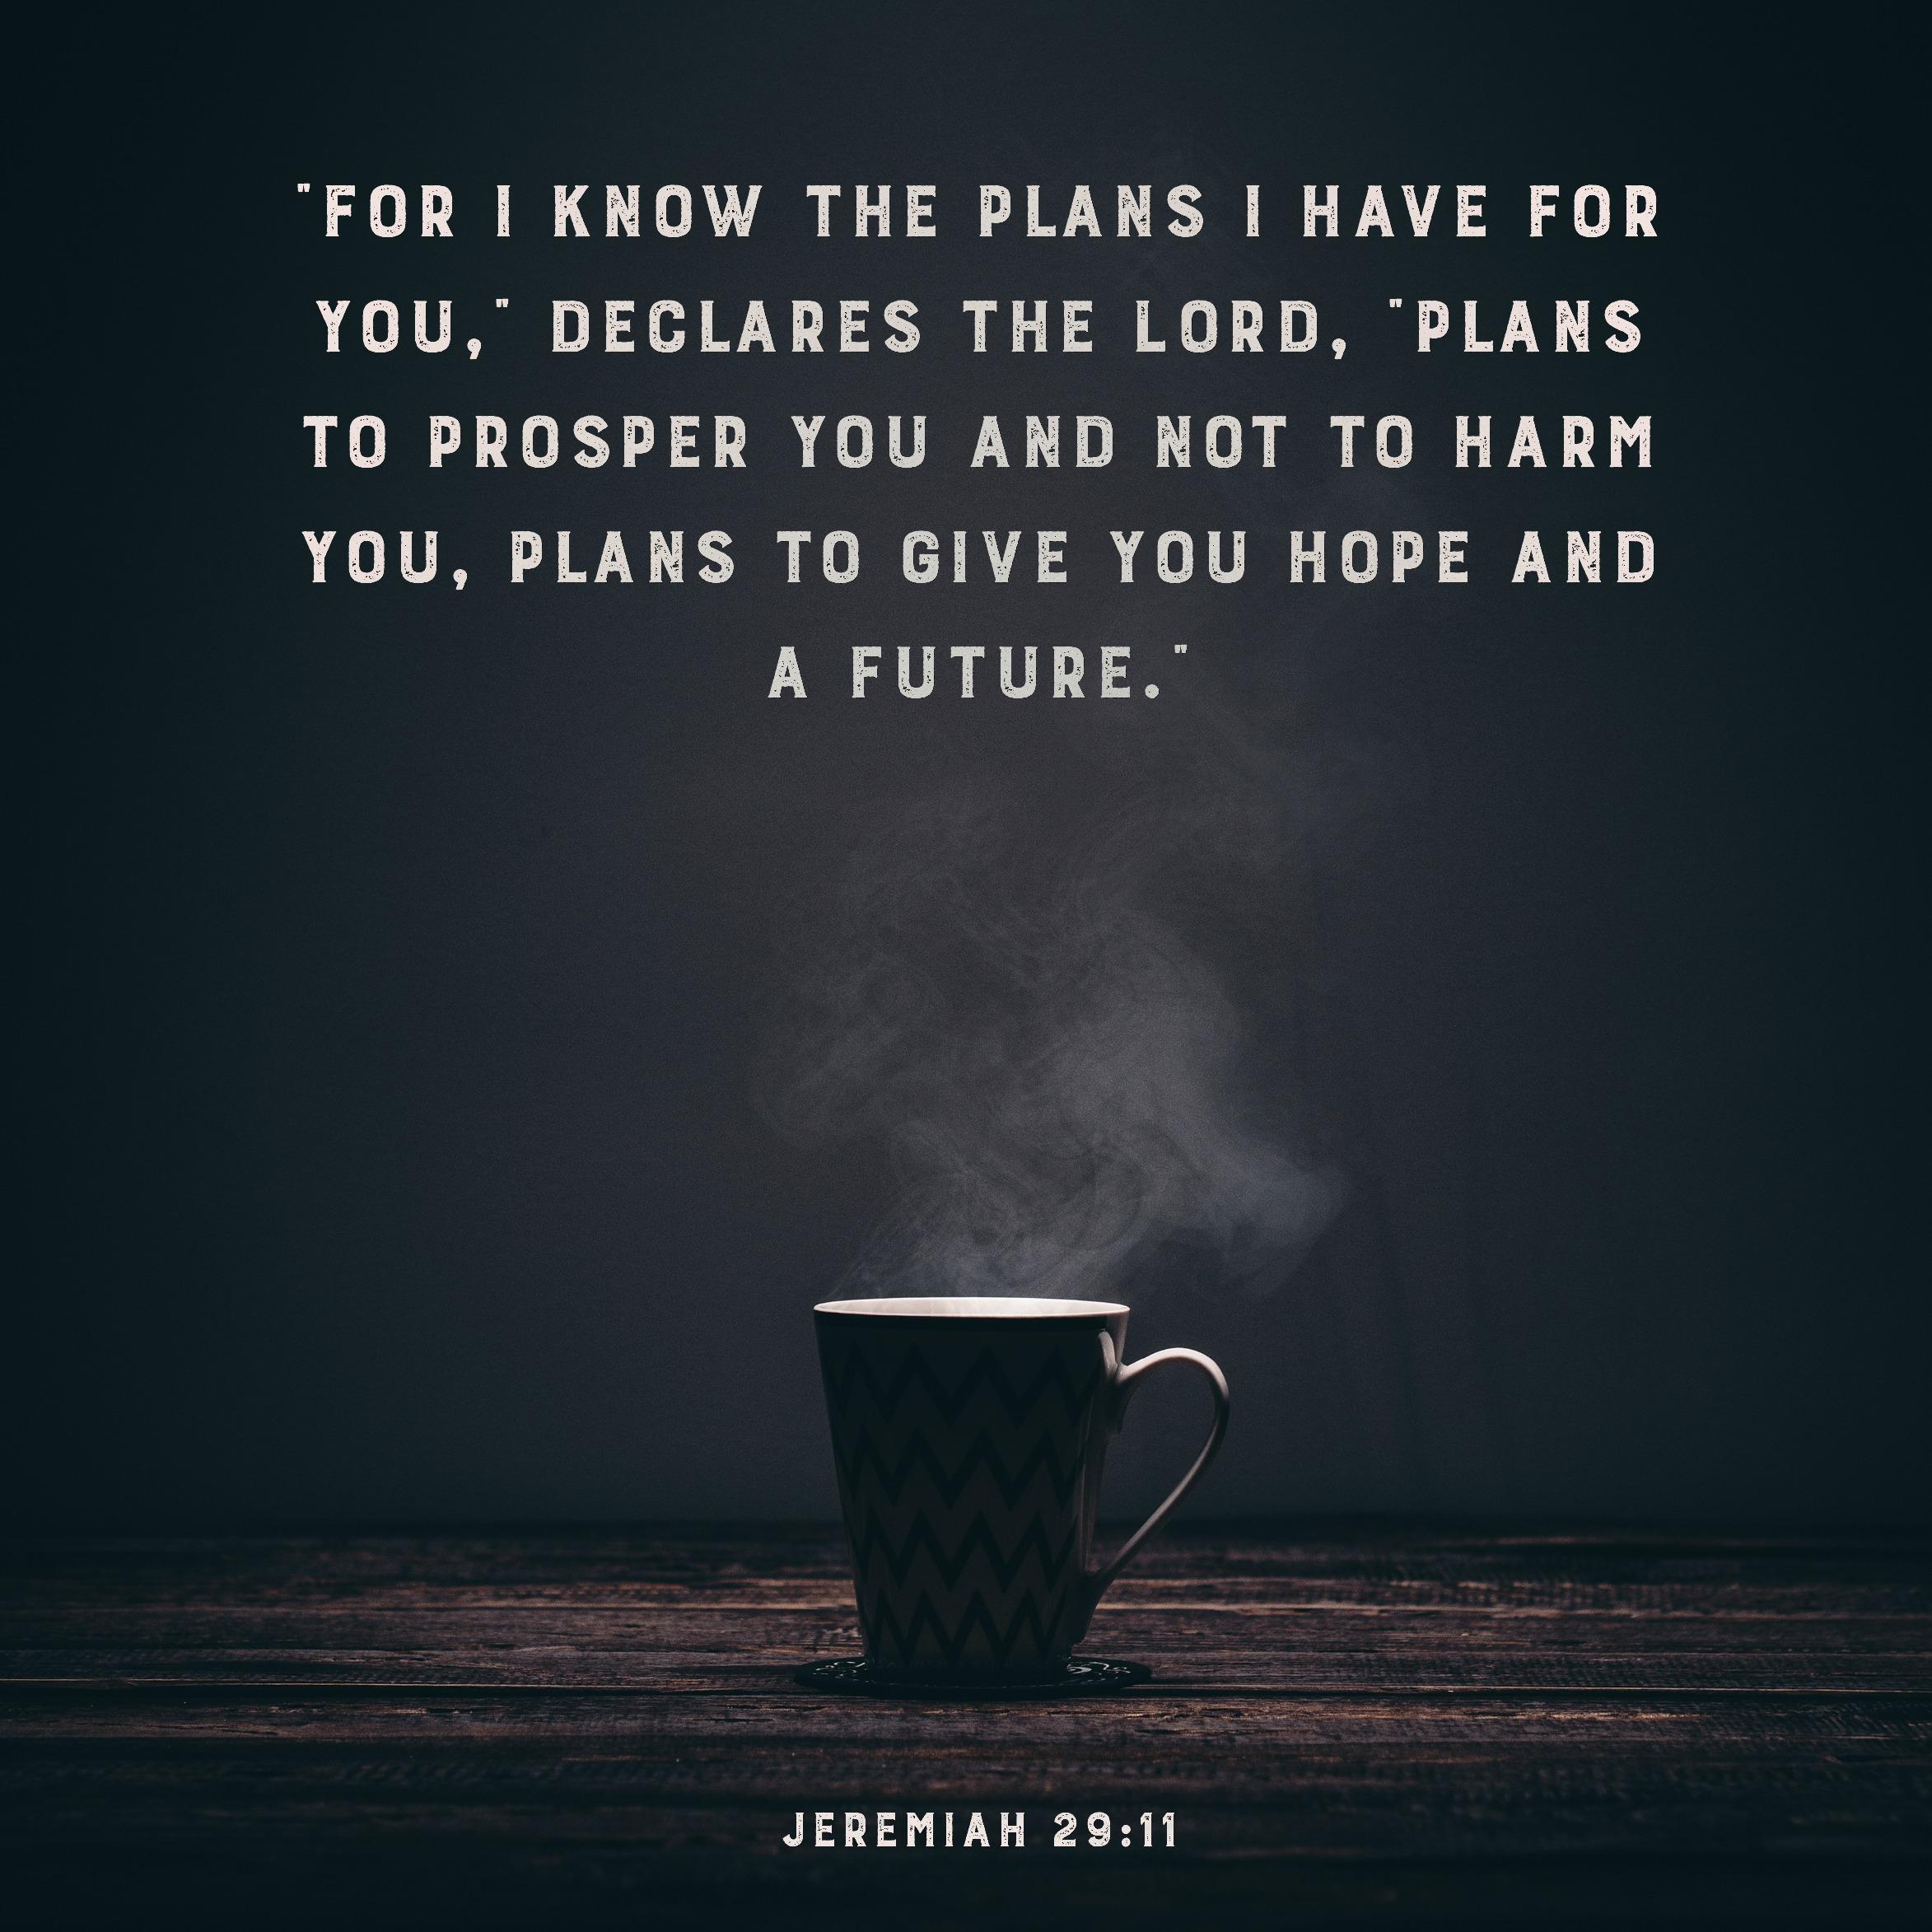 Daily Verse: Jeremiah 29:11